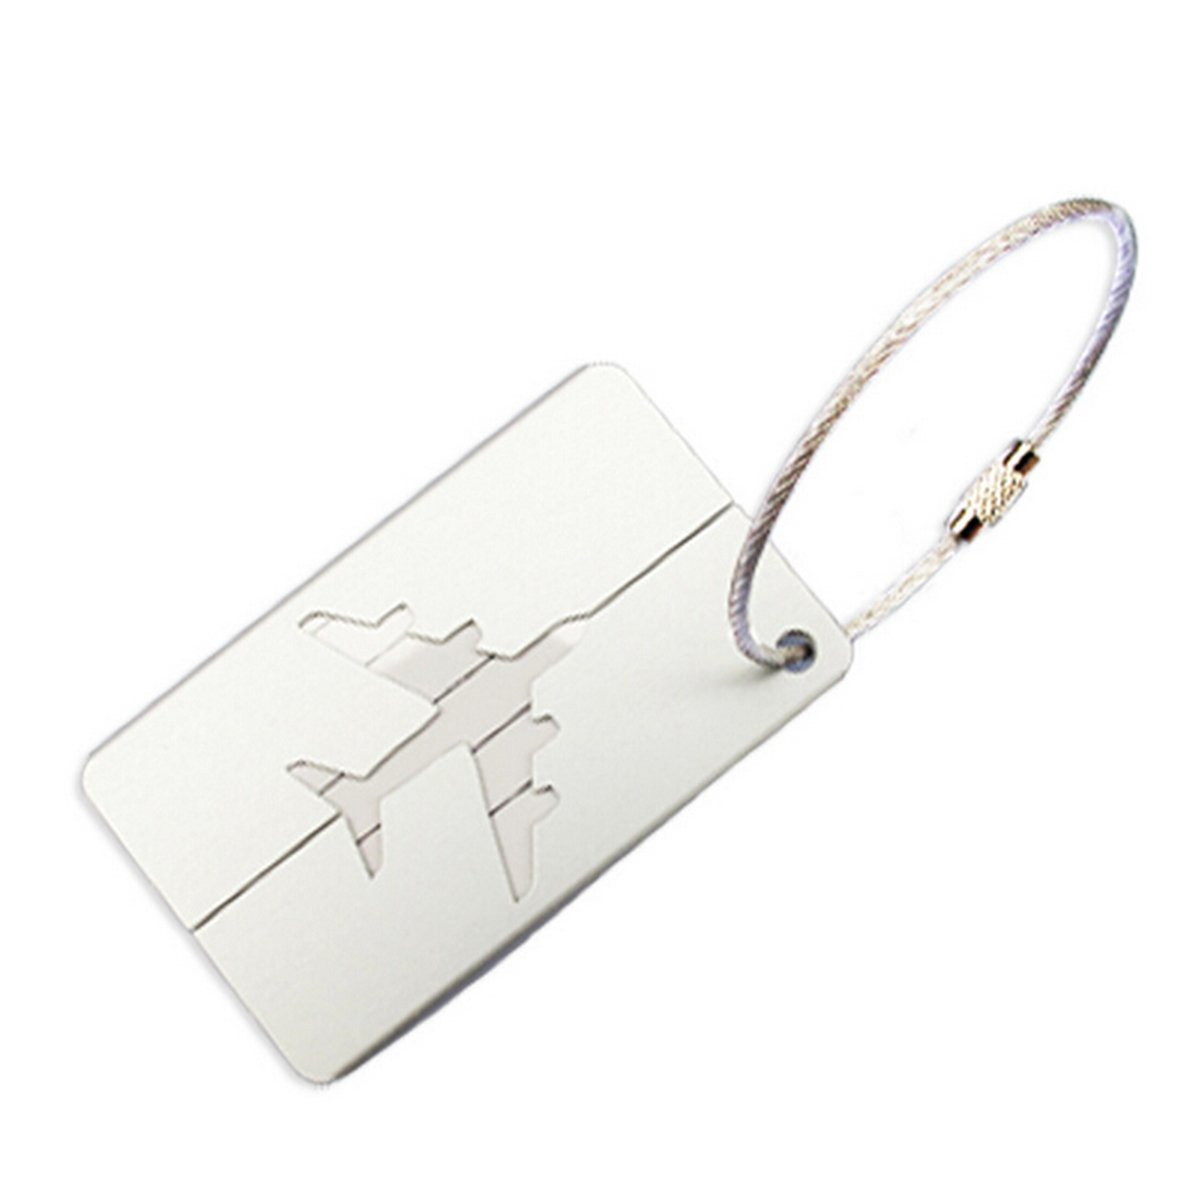 FENICAL Travel Luggage Tag Aluminum Airplane Luggage Tag Baggage Handbag Tag (Silver)